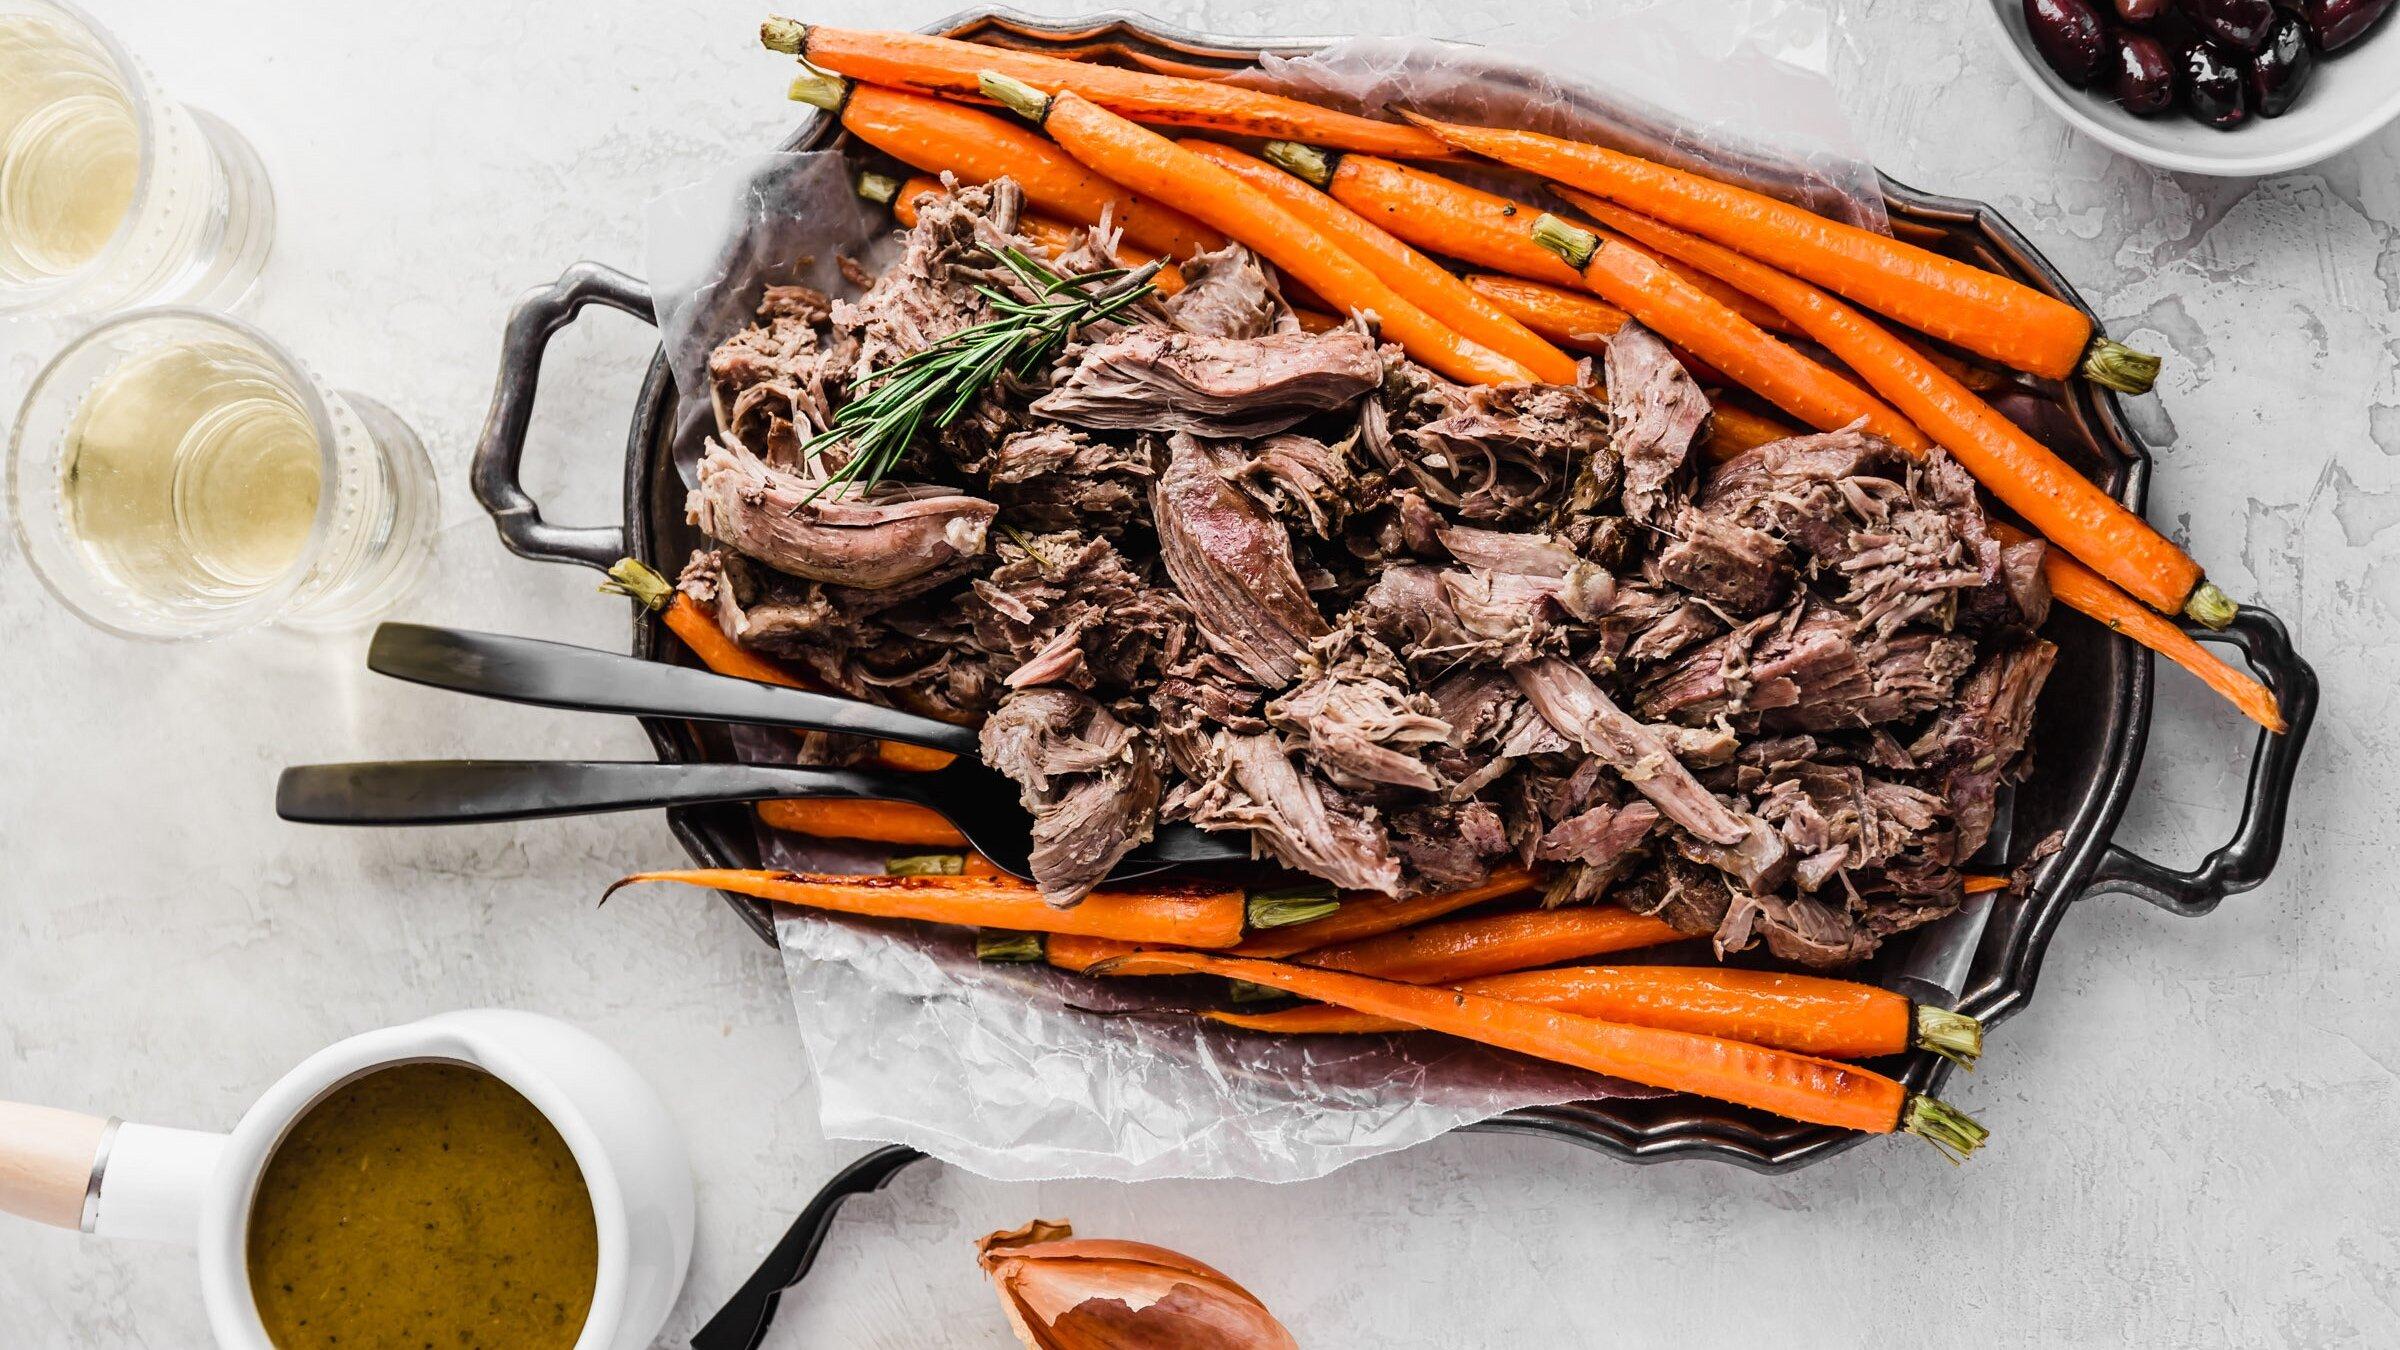 SLT-Passover-leg-of-lamb-10.jpg